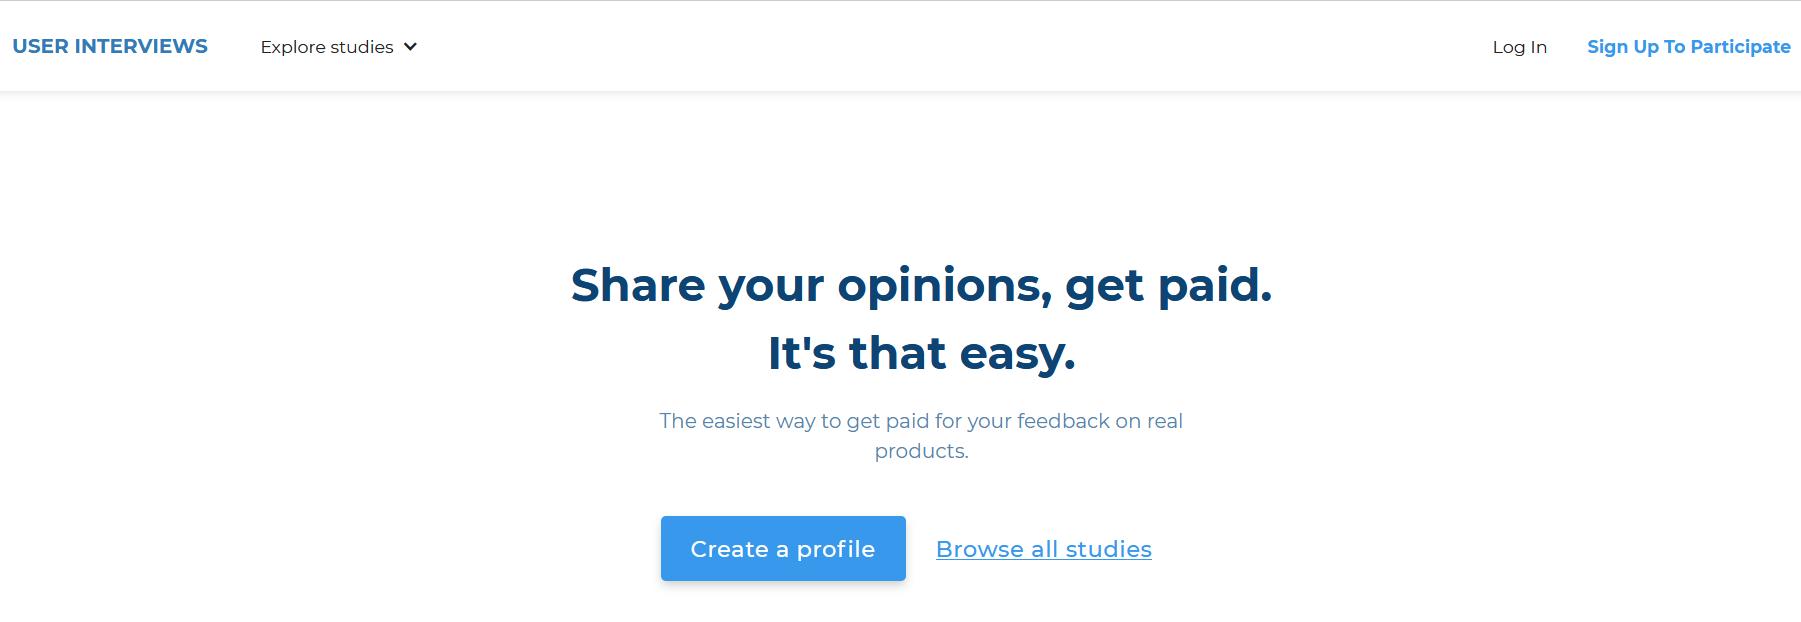 user interviews homepage